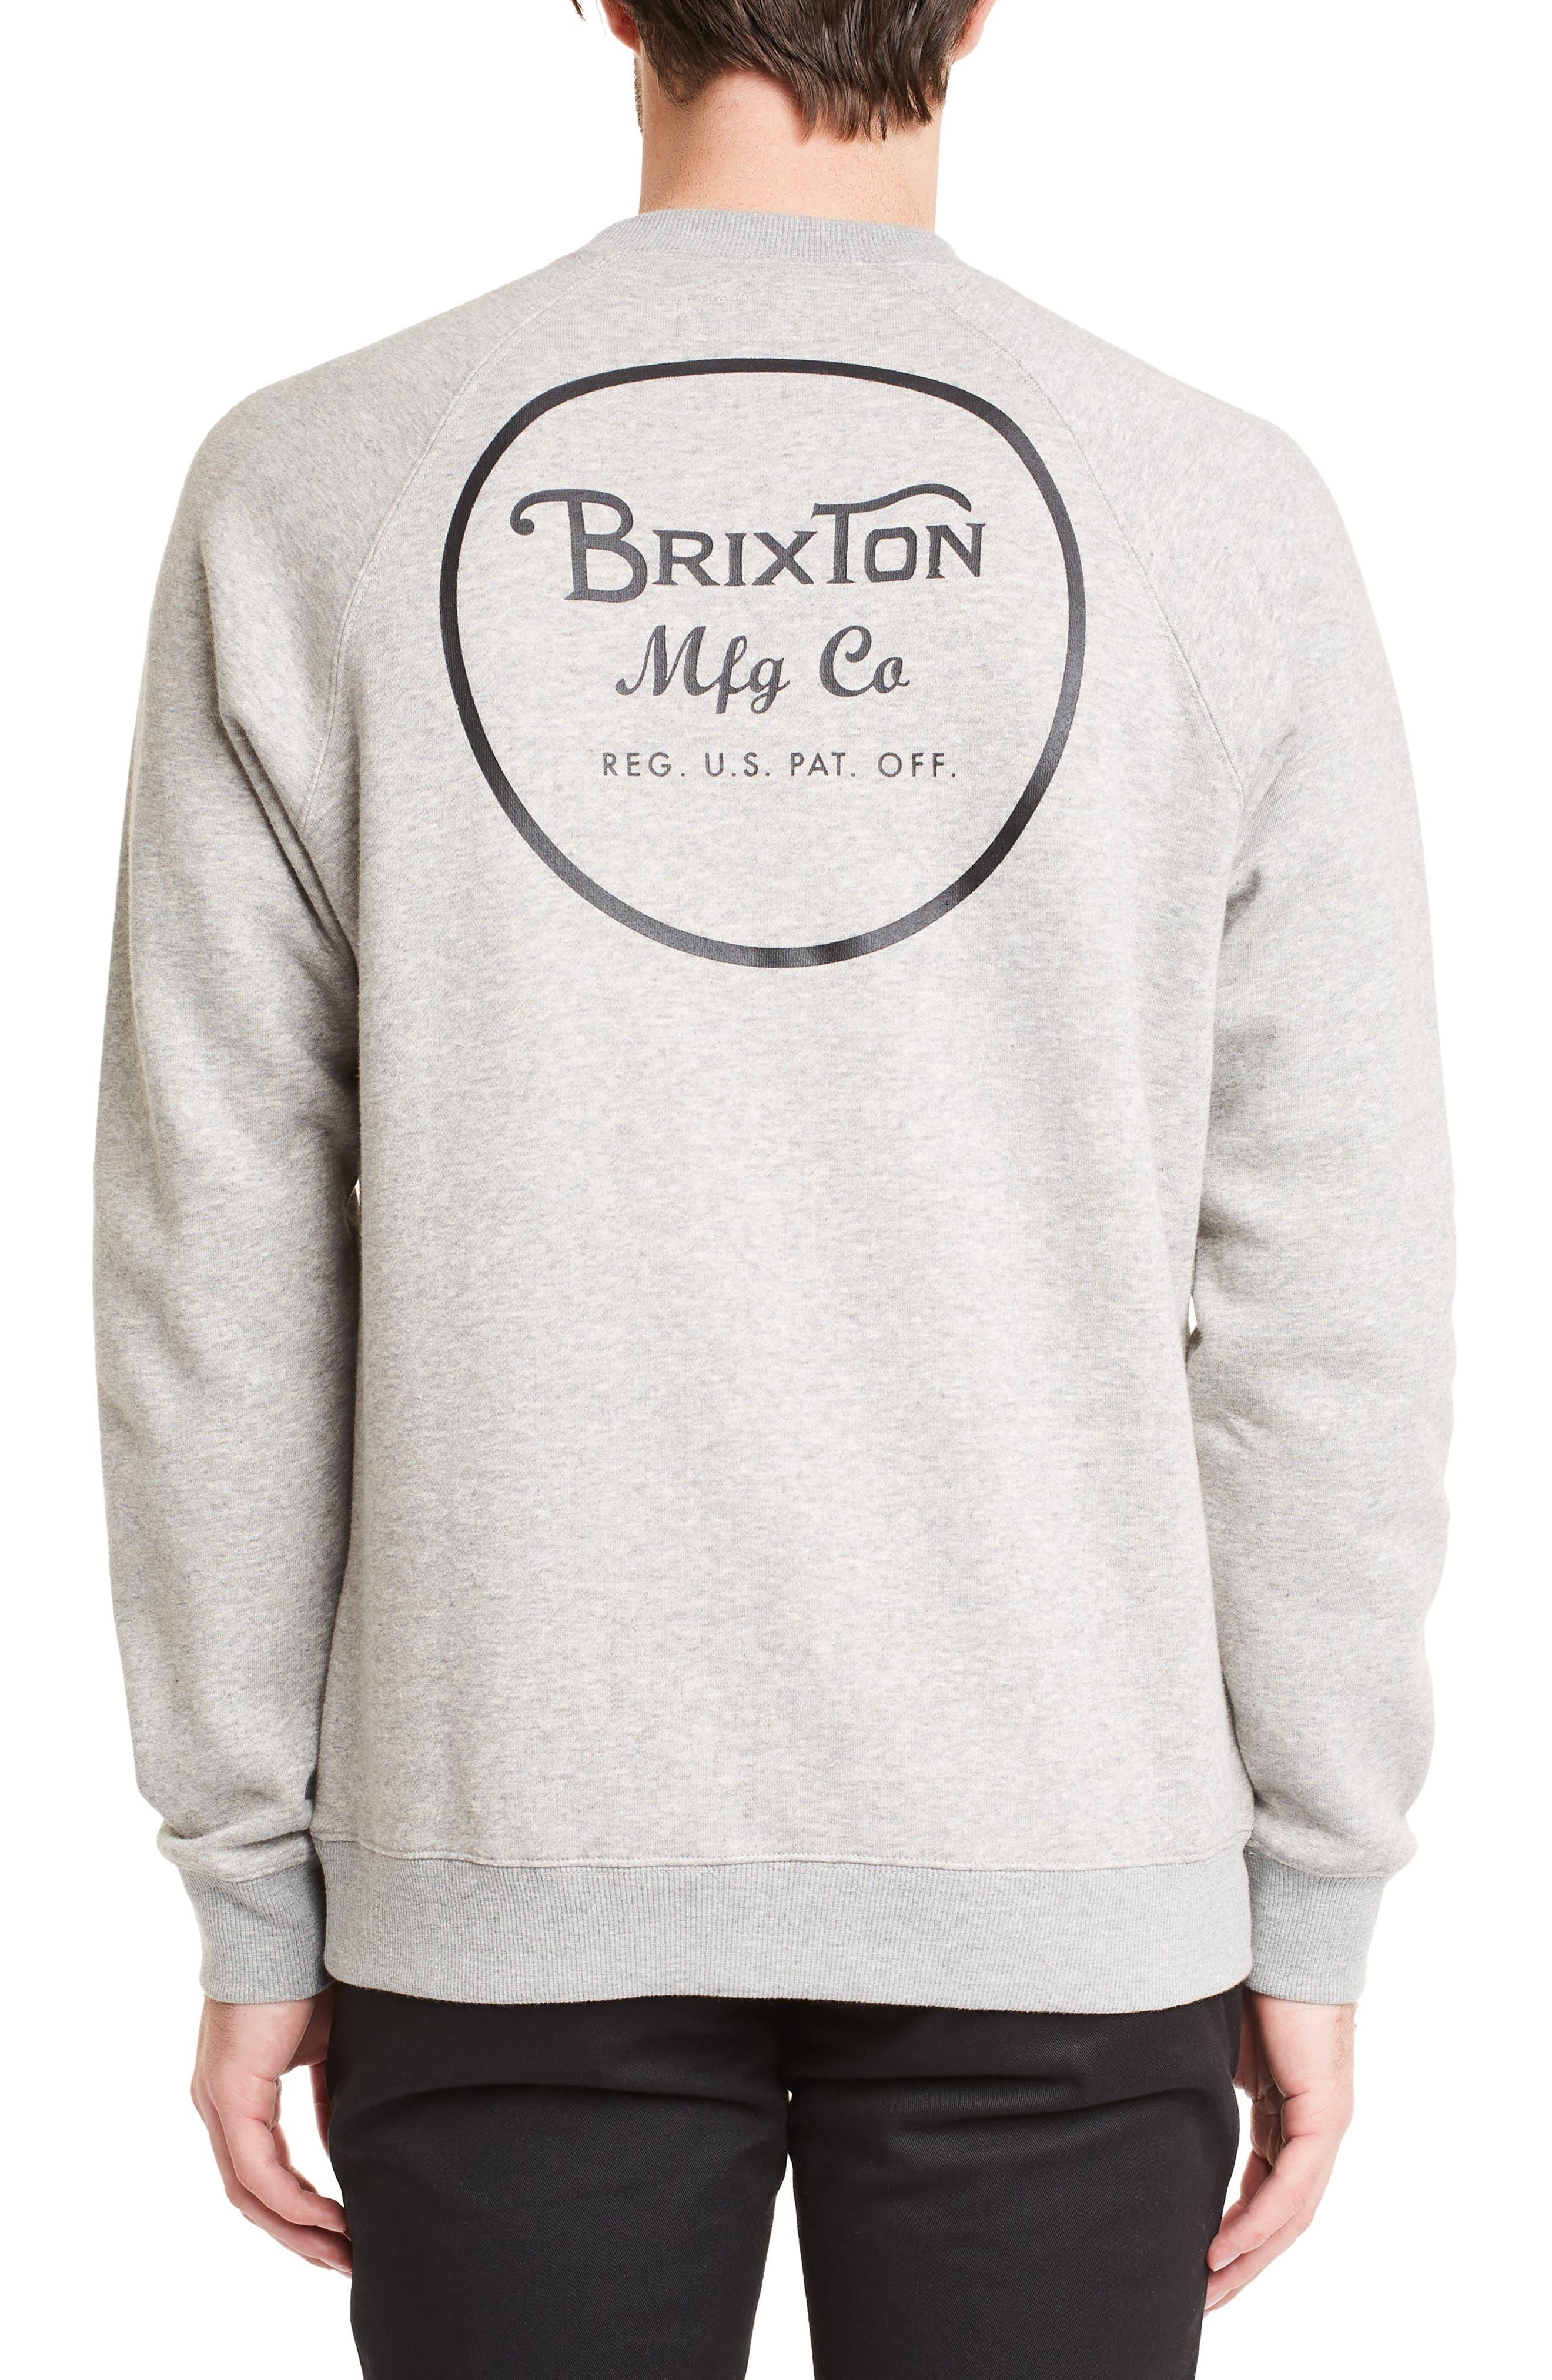 5726437943 Men s Brixton Clothing